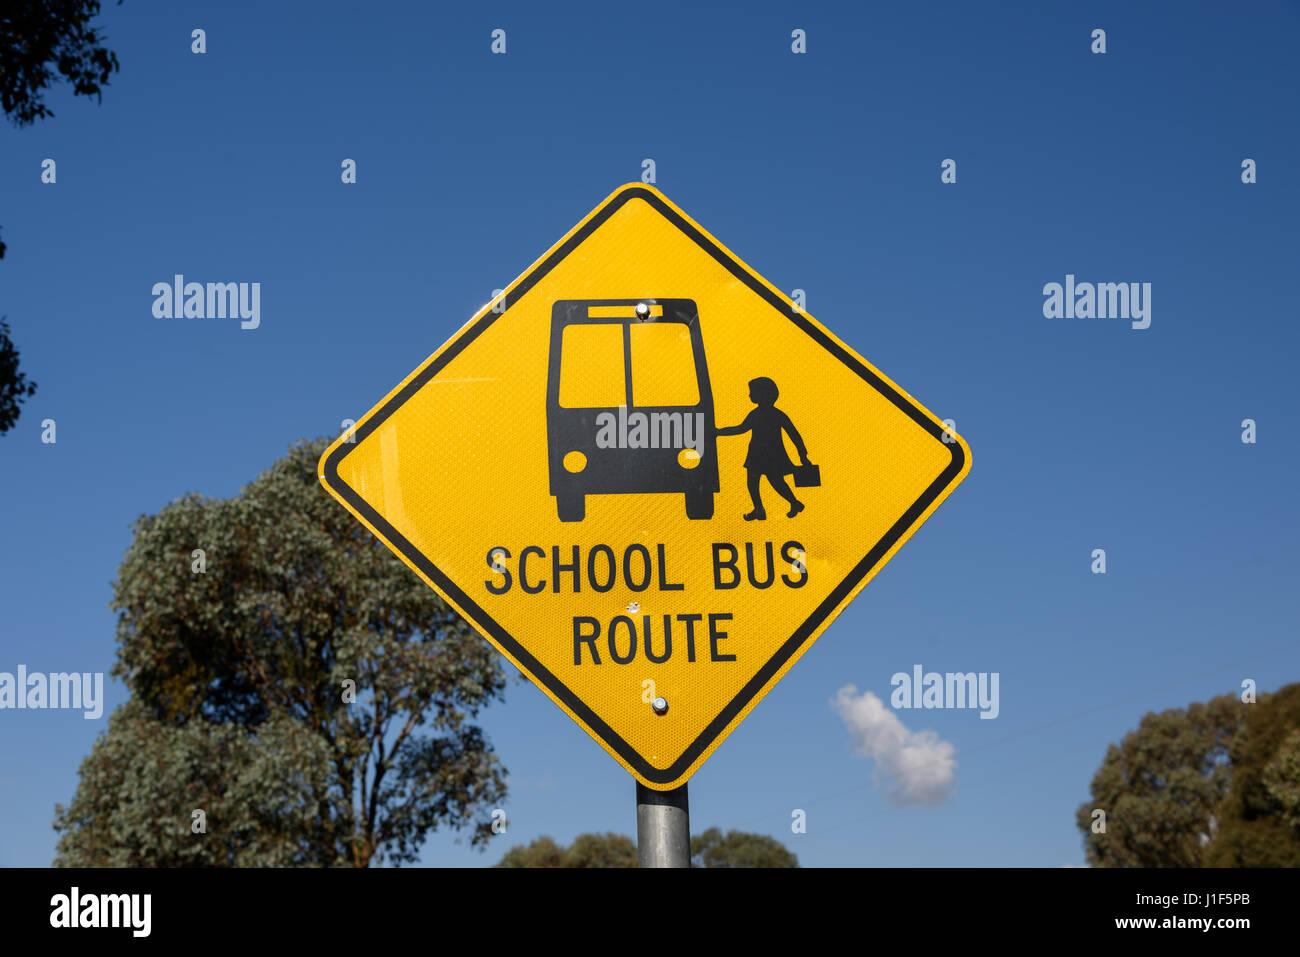 school bus sign stock photos amp school bus sign stock